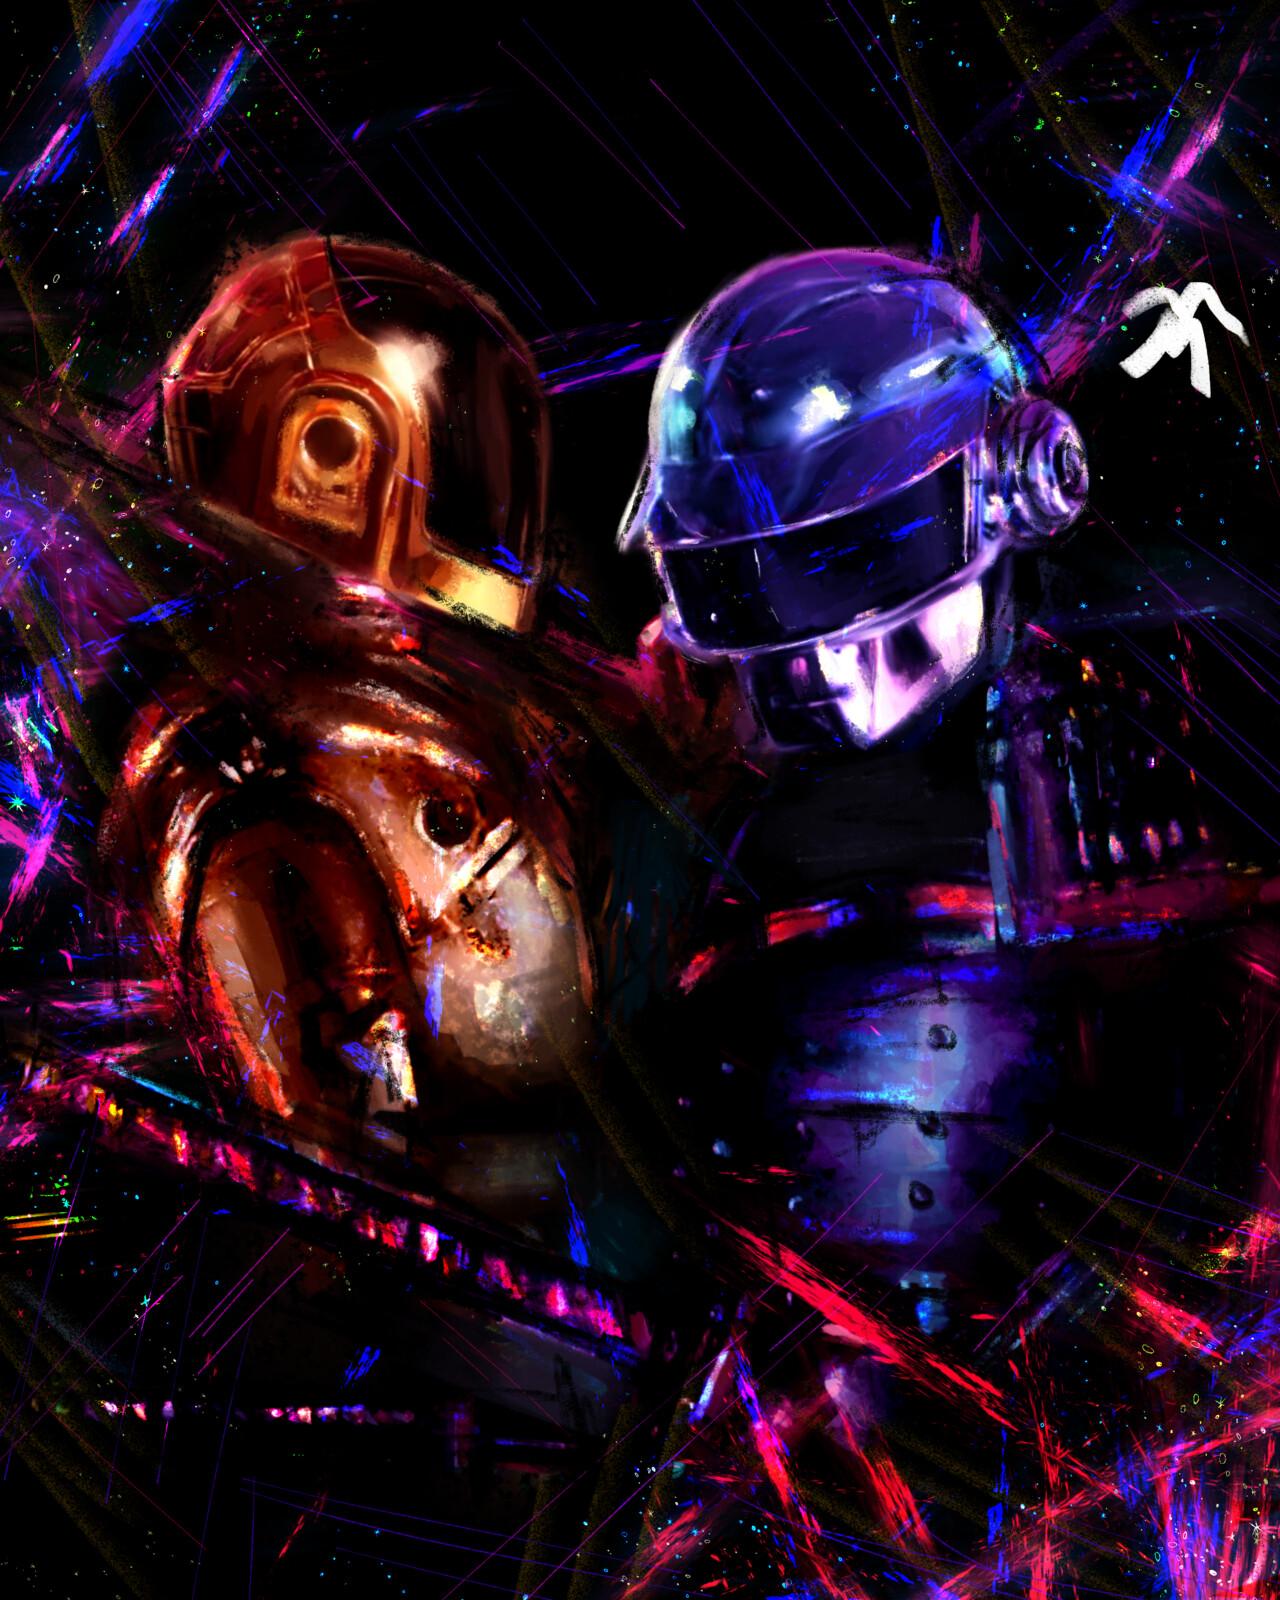 Art Tribute to Daft Punk